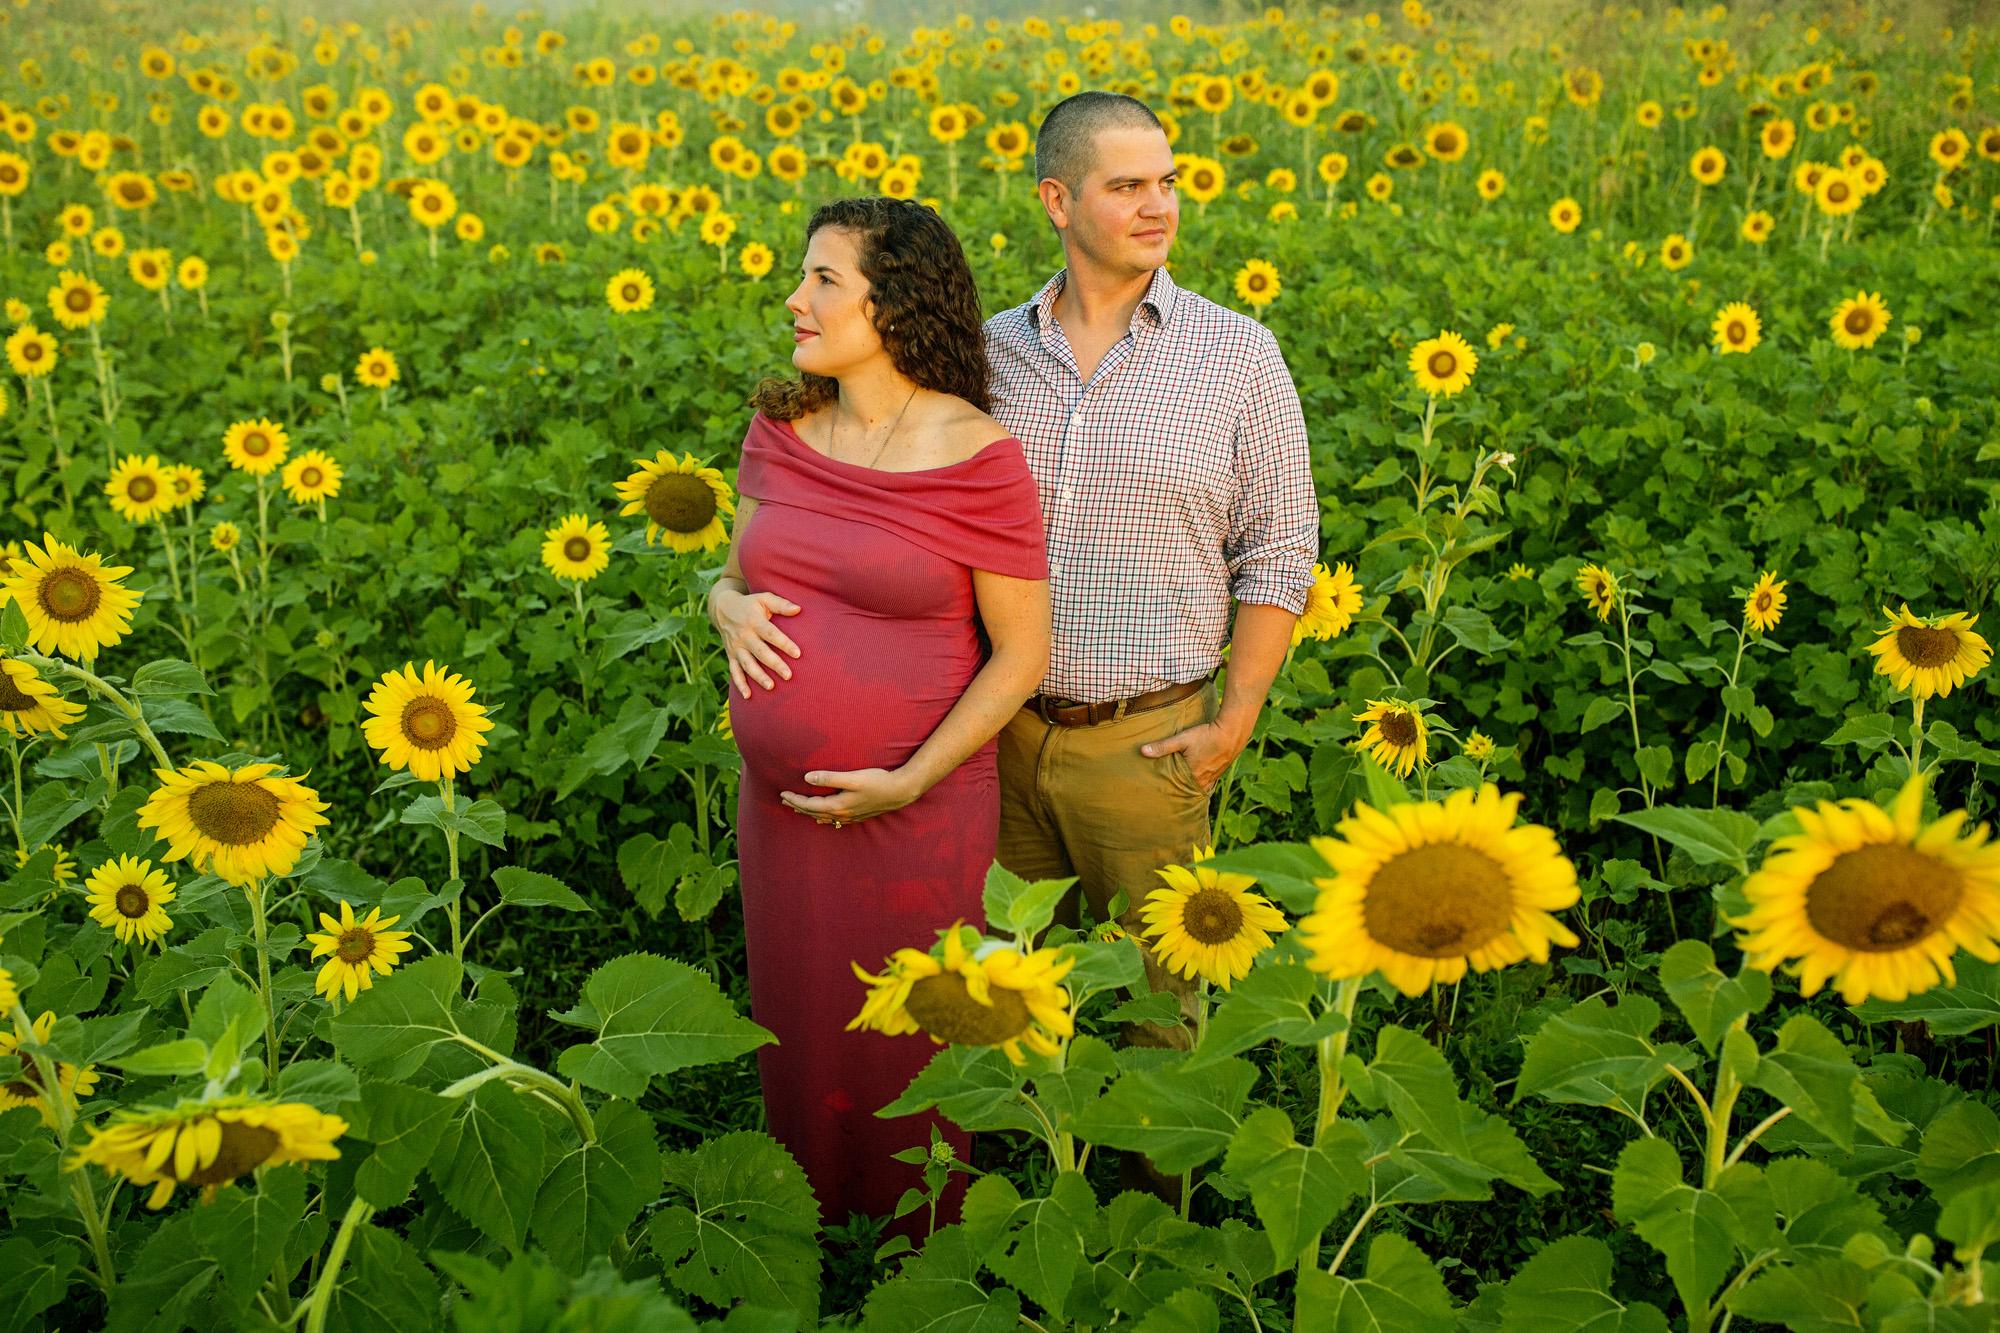 Seriously_Sabrina_Photography_Lexington_Frankfort_Kentucky_Maternity_Mini_Sunflowers_Johns17.jpg